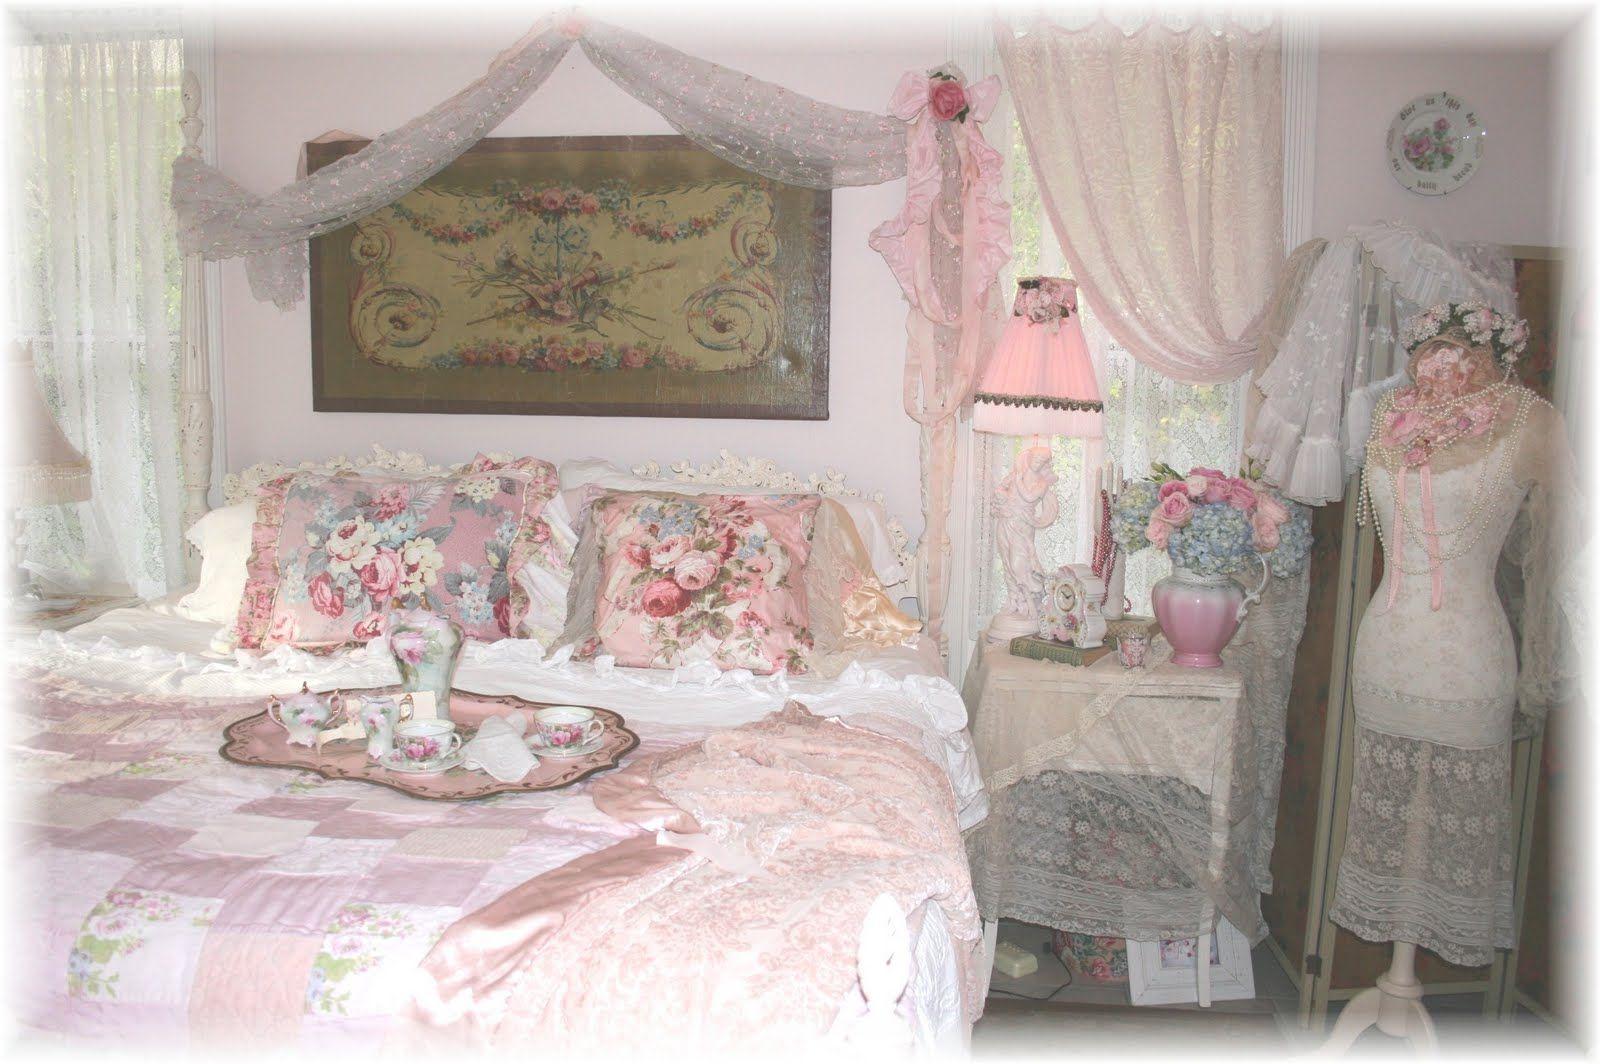 rose petals on bed ideas Google Search Cozy room